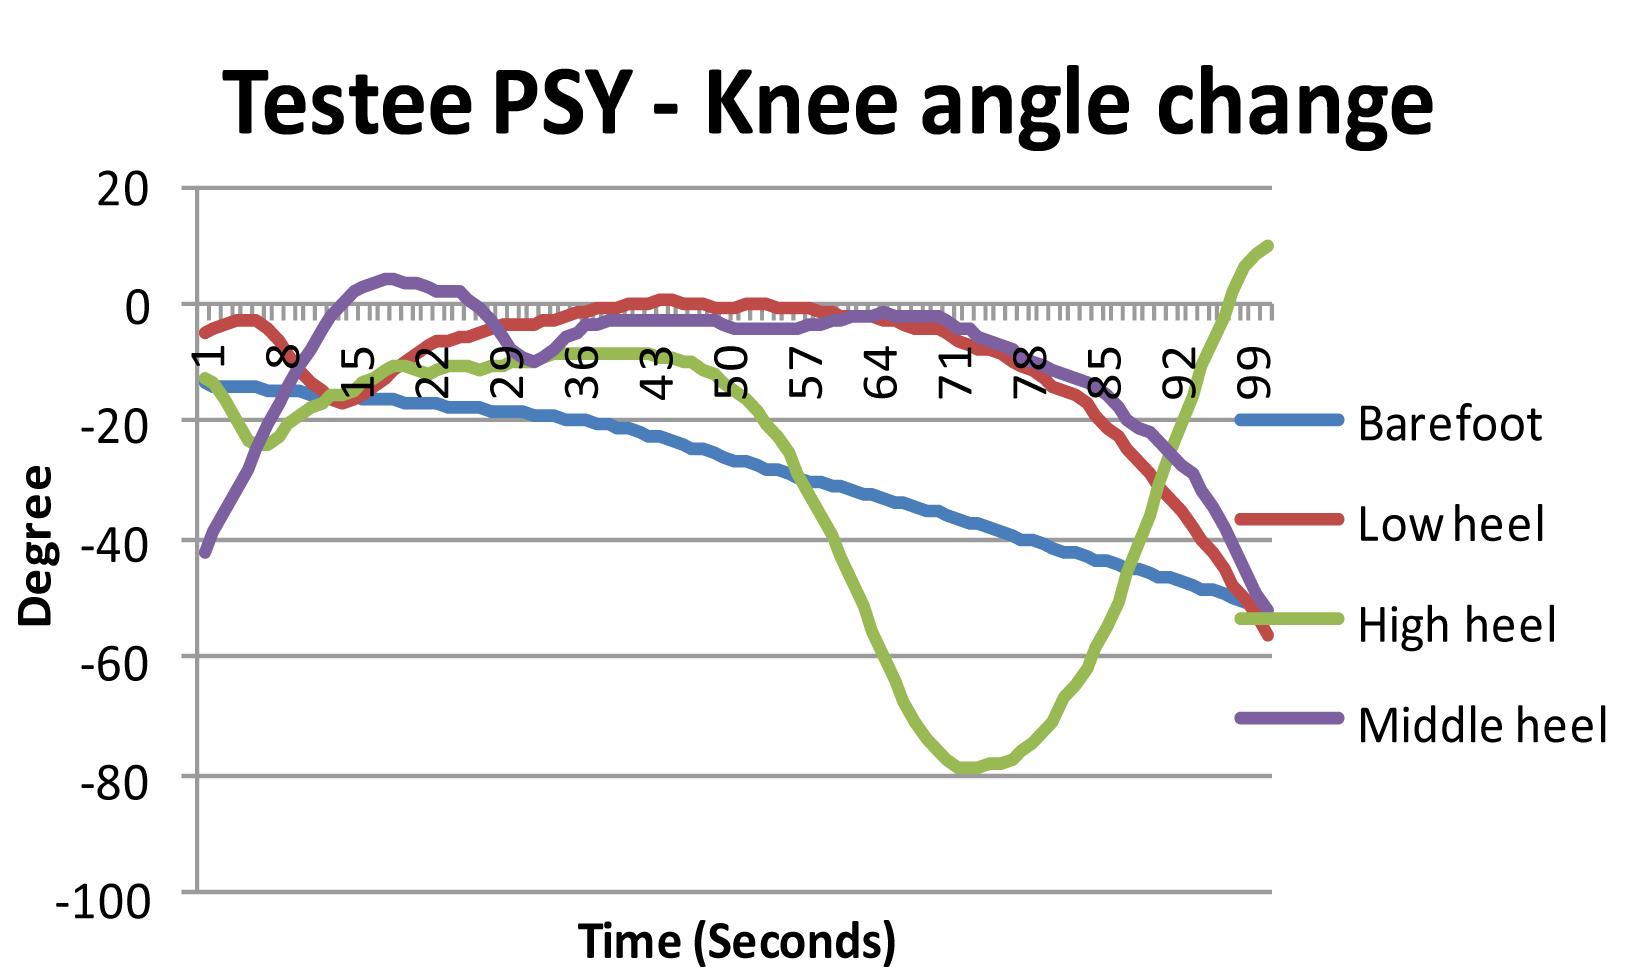 Testee PSY - Knee angle change